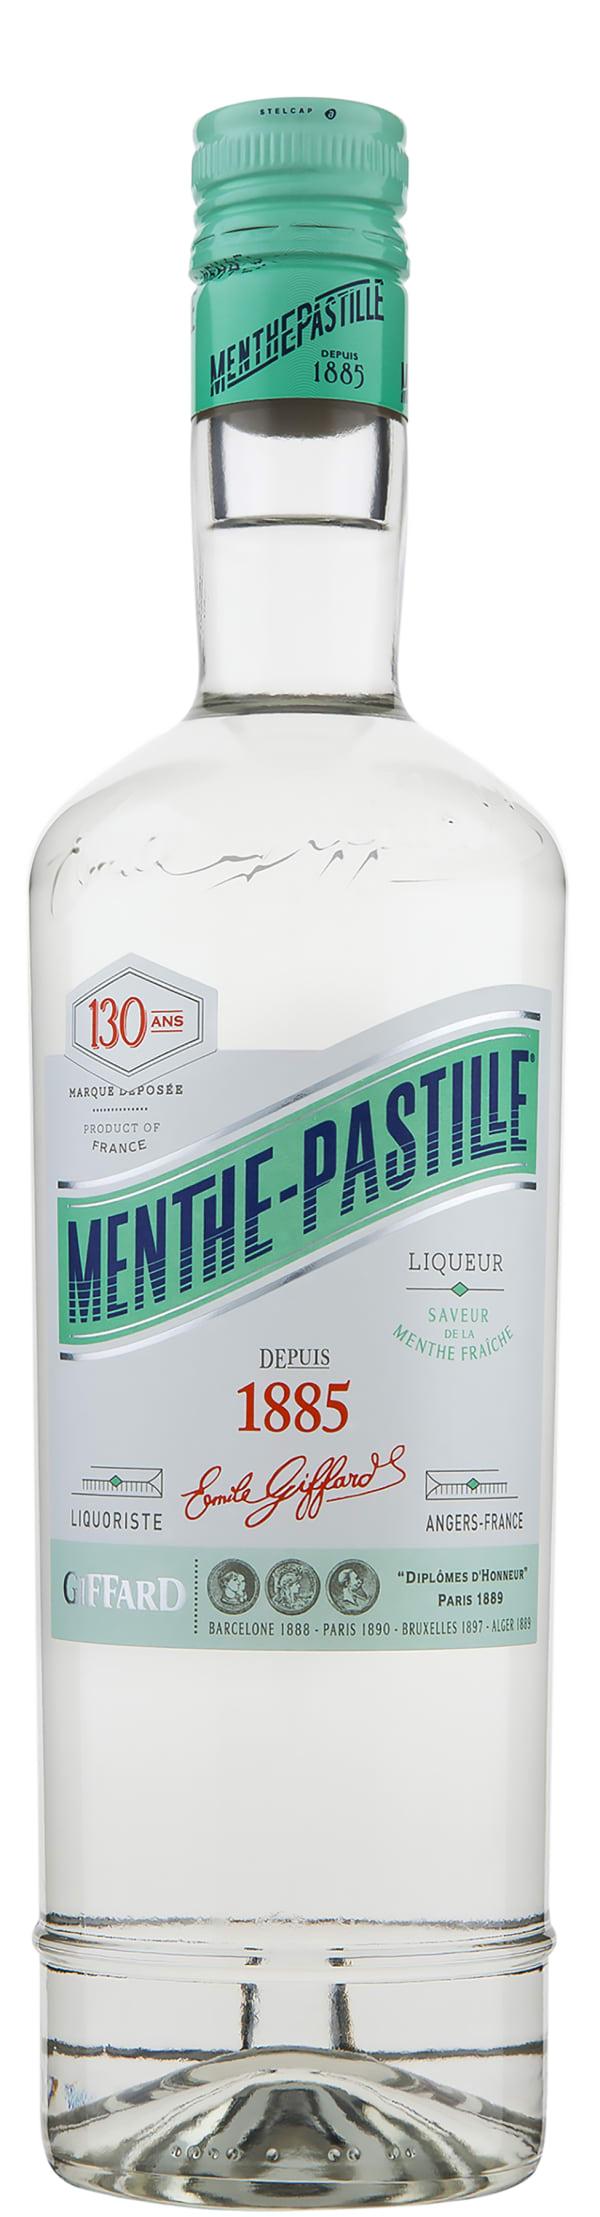 Giffard Menthe Pastille